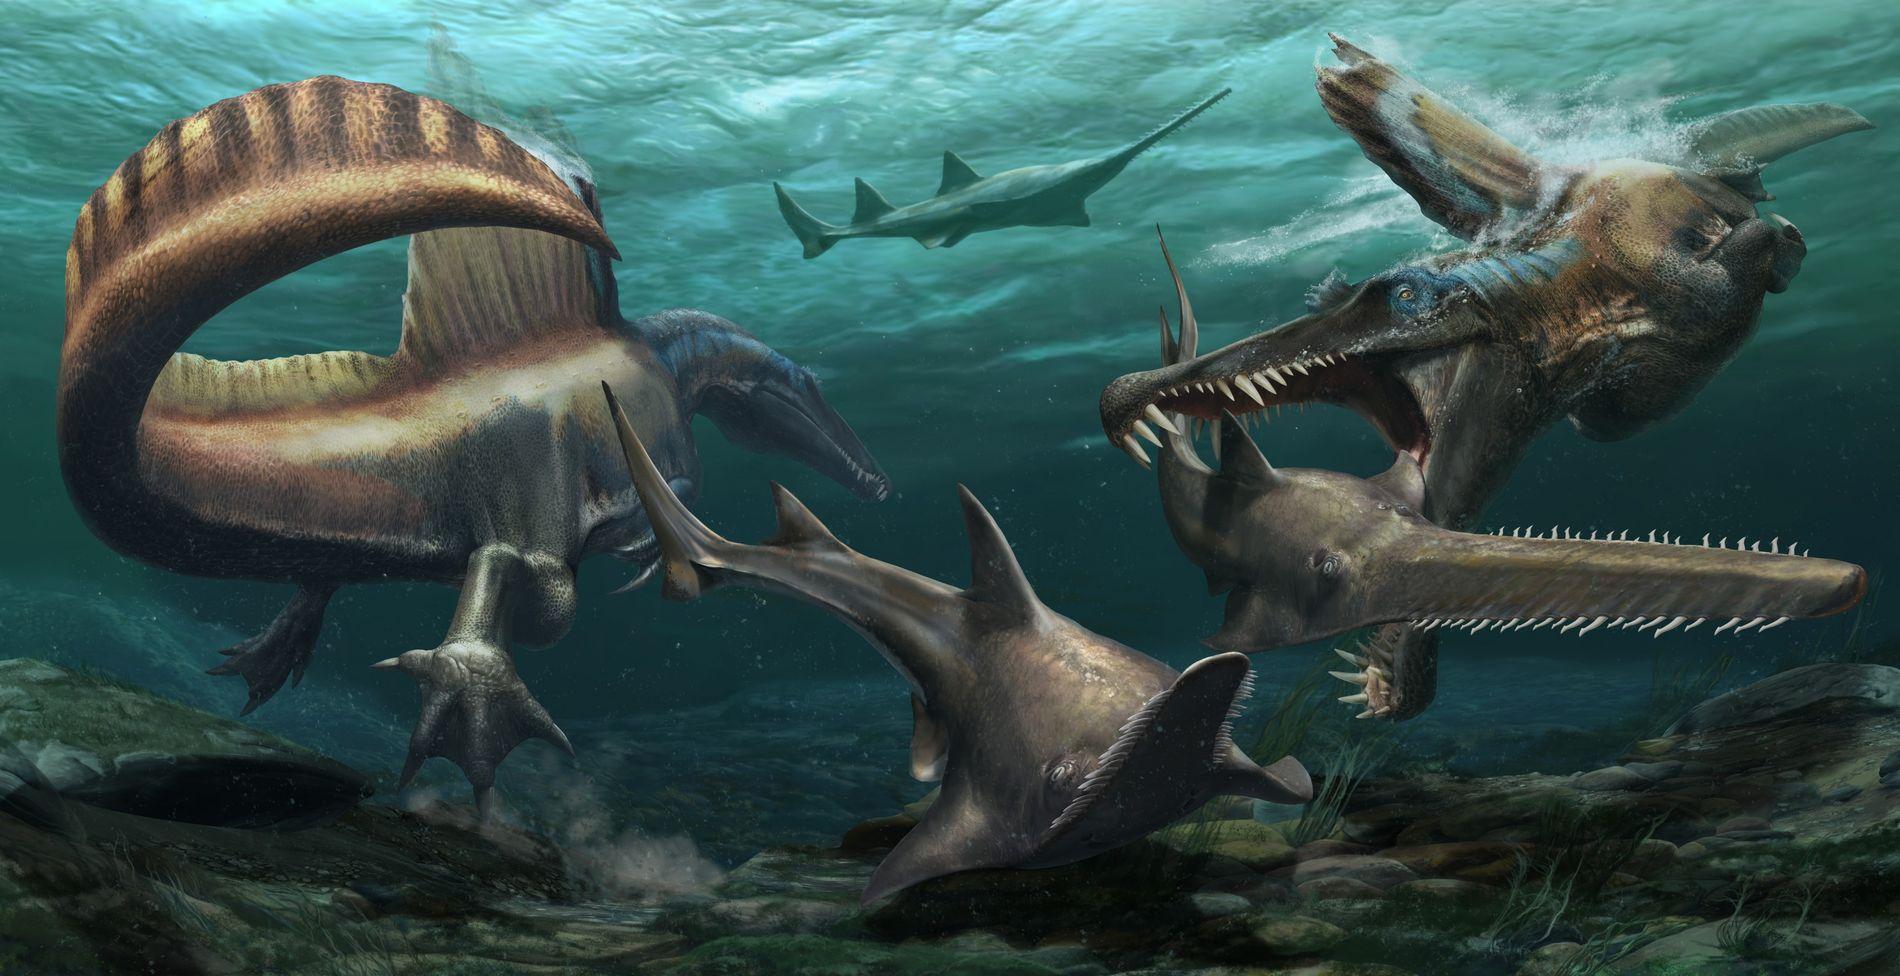 Le Spinosaurus, premier dinosaure semi-aquatique confirmé